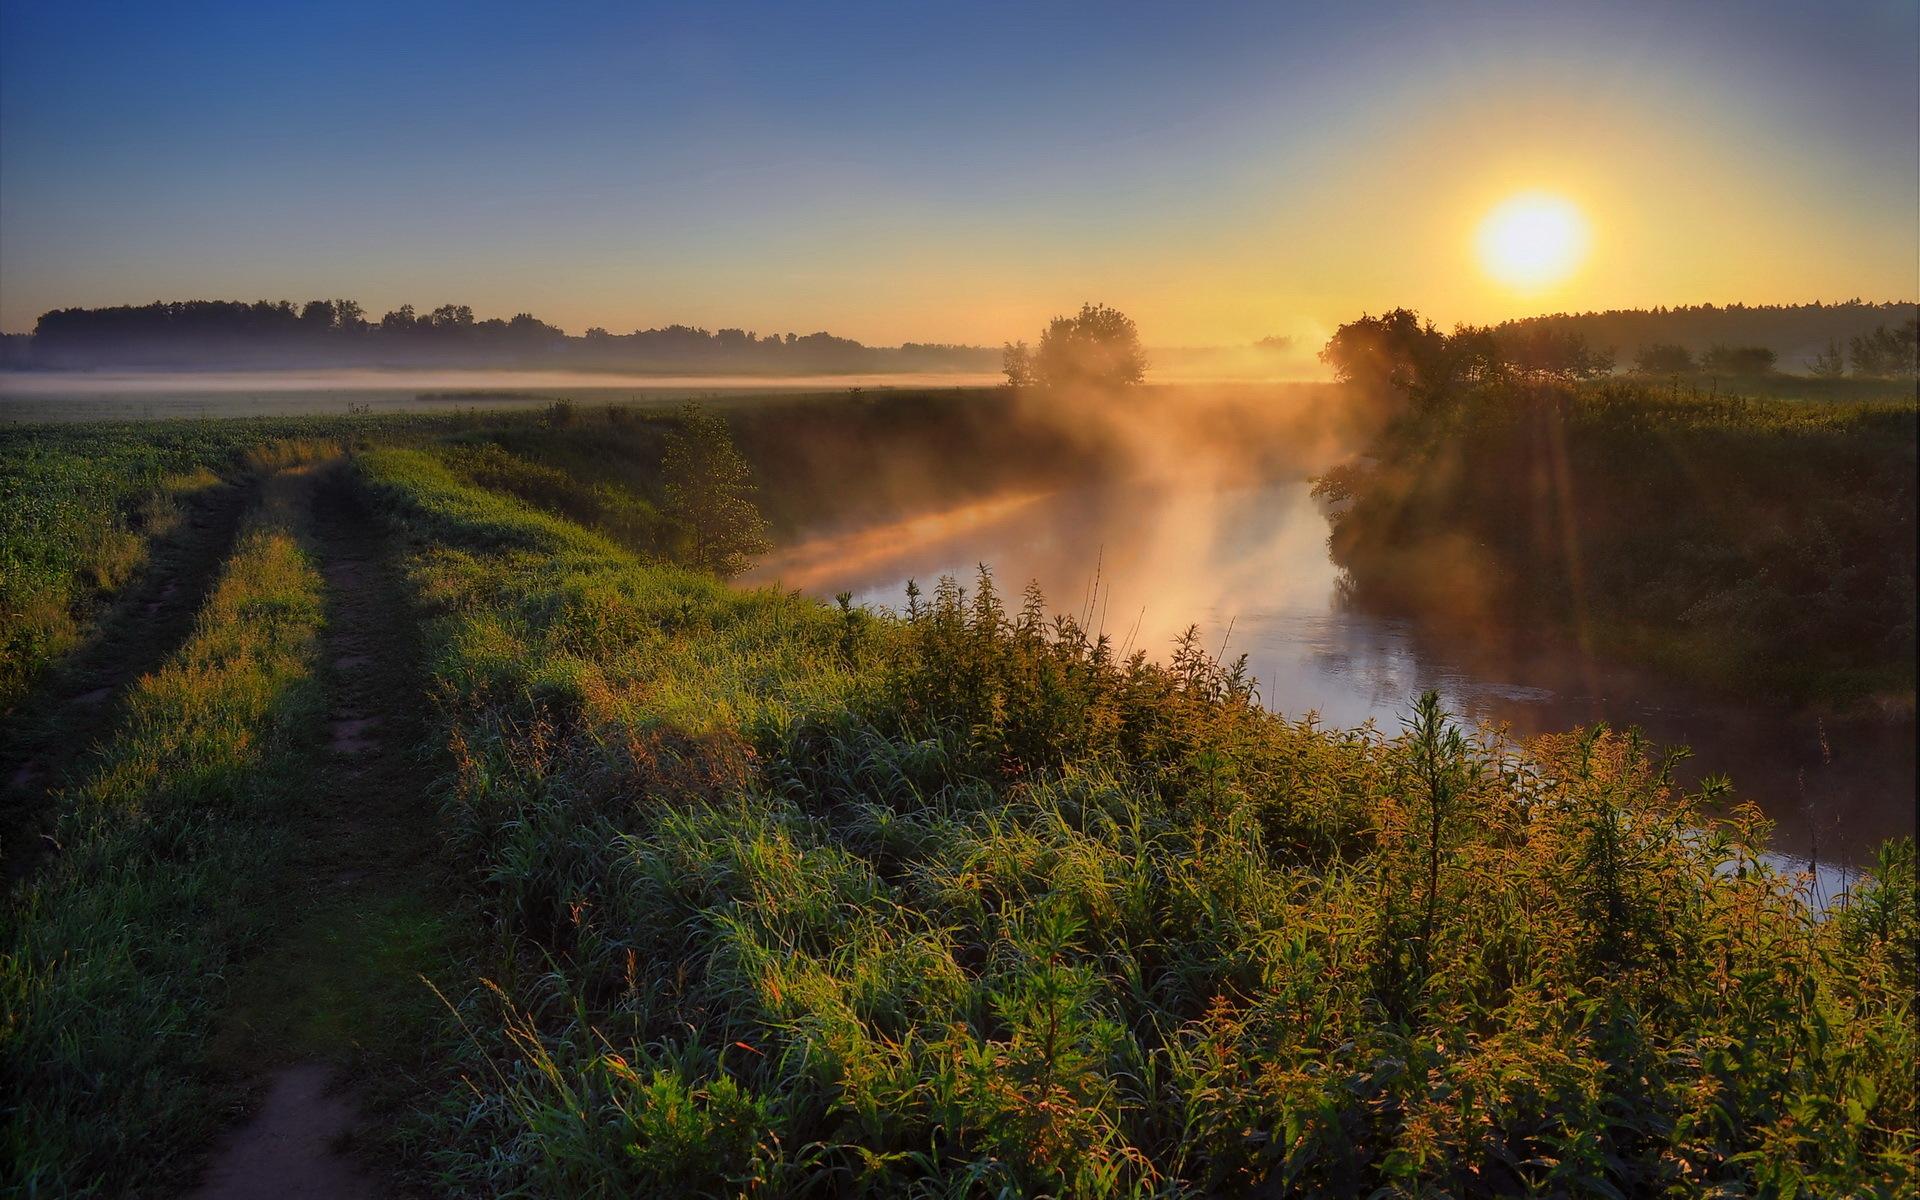 Sunrise rive mist